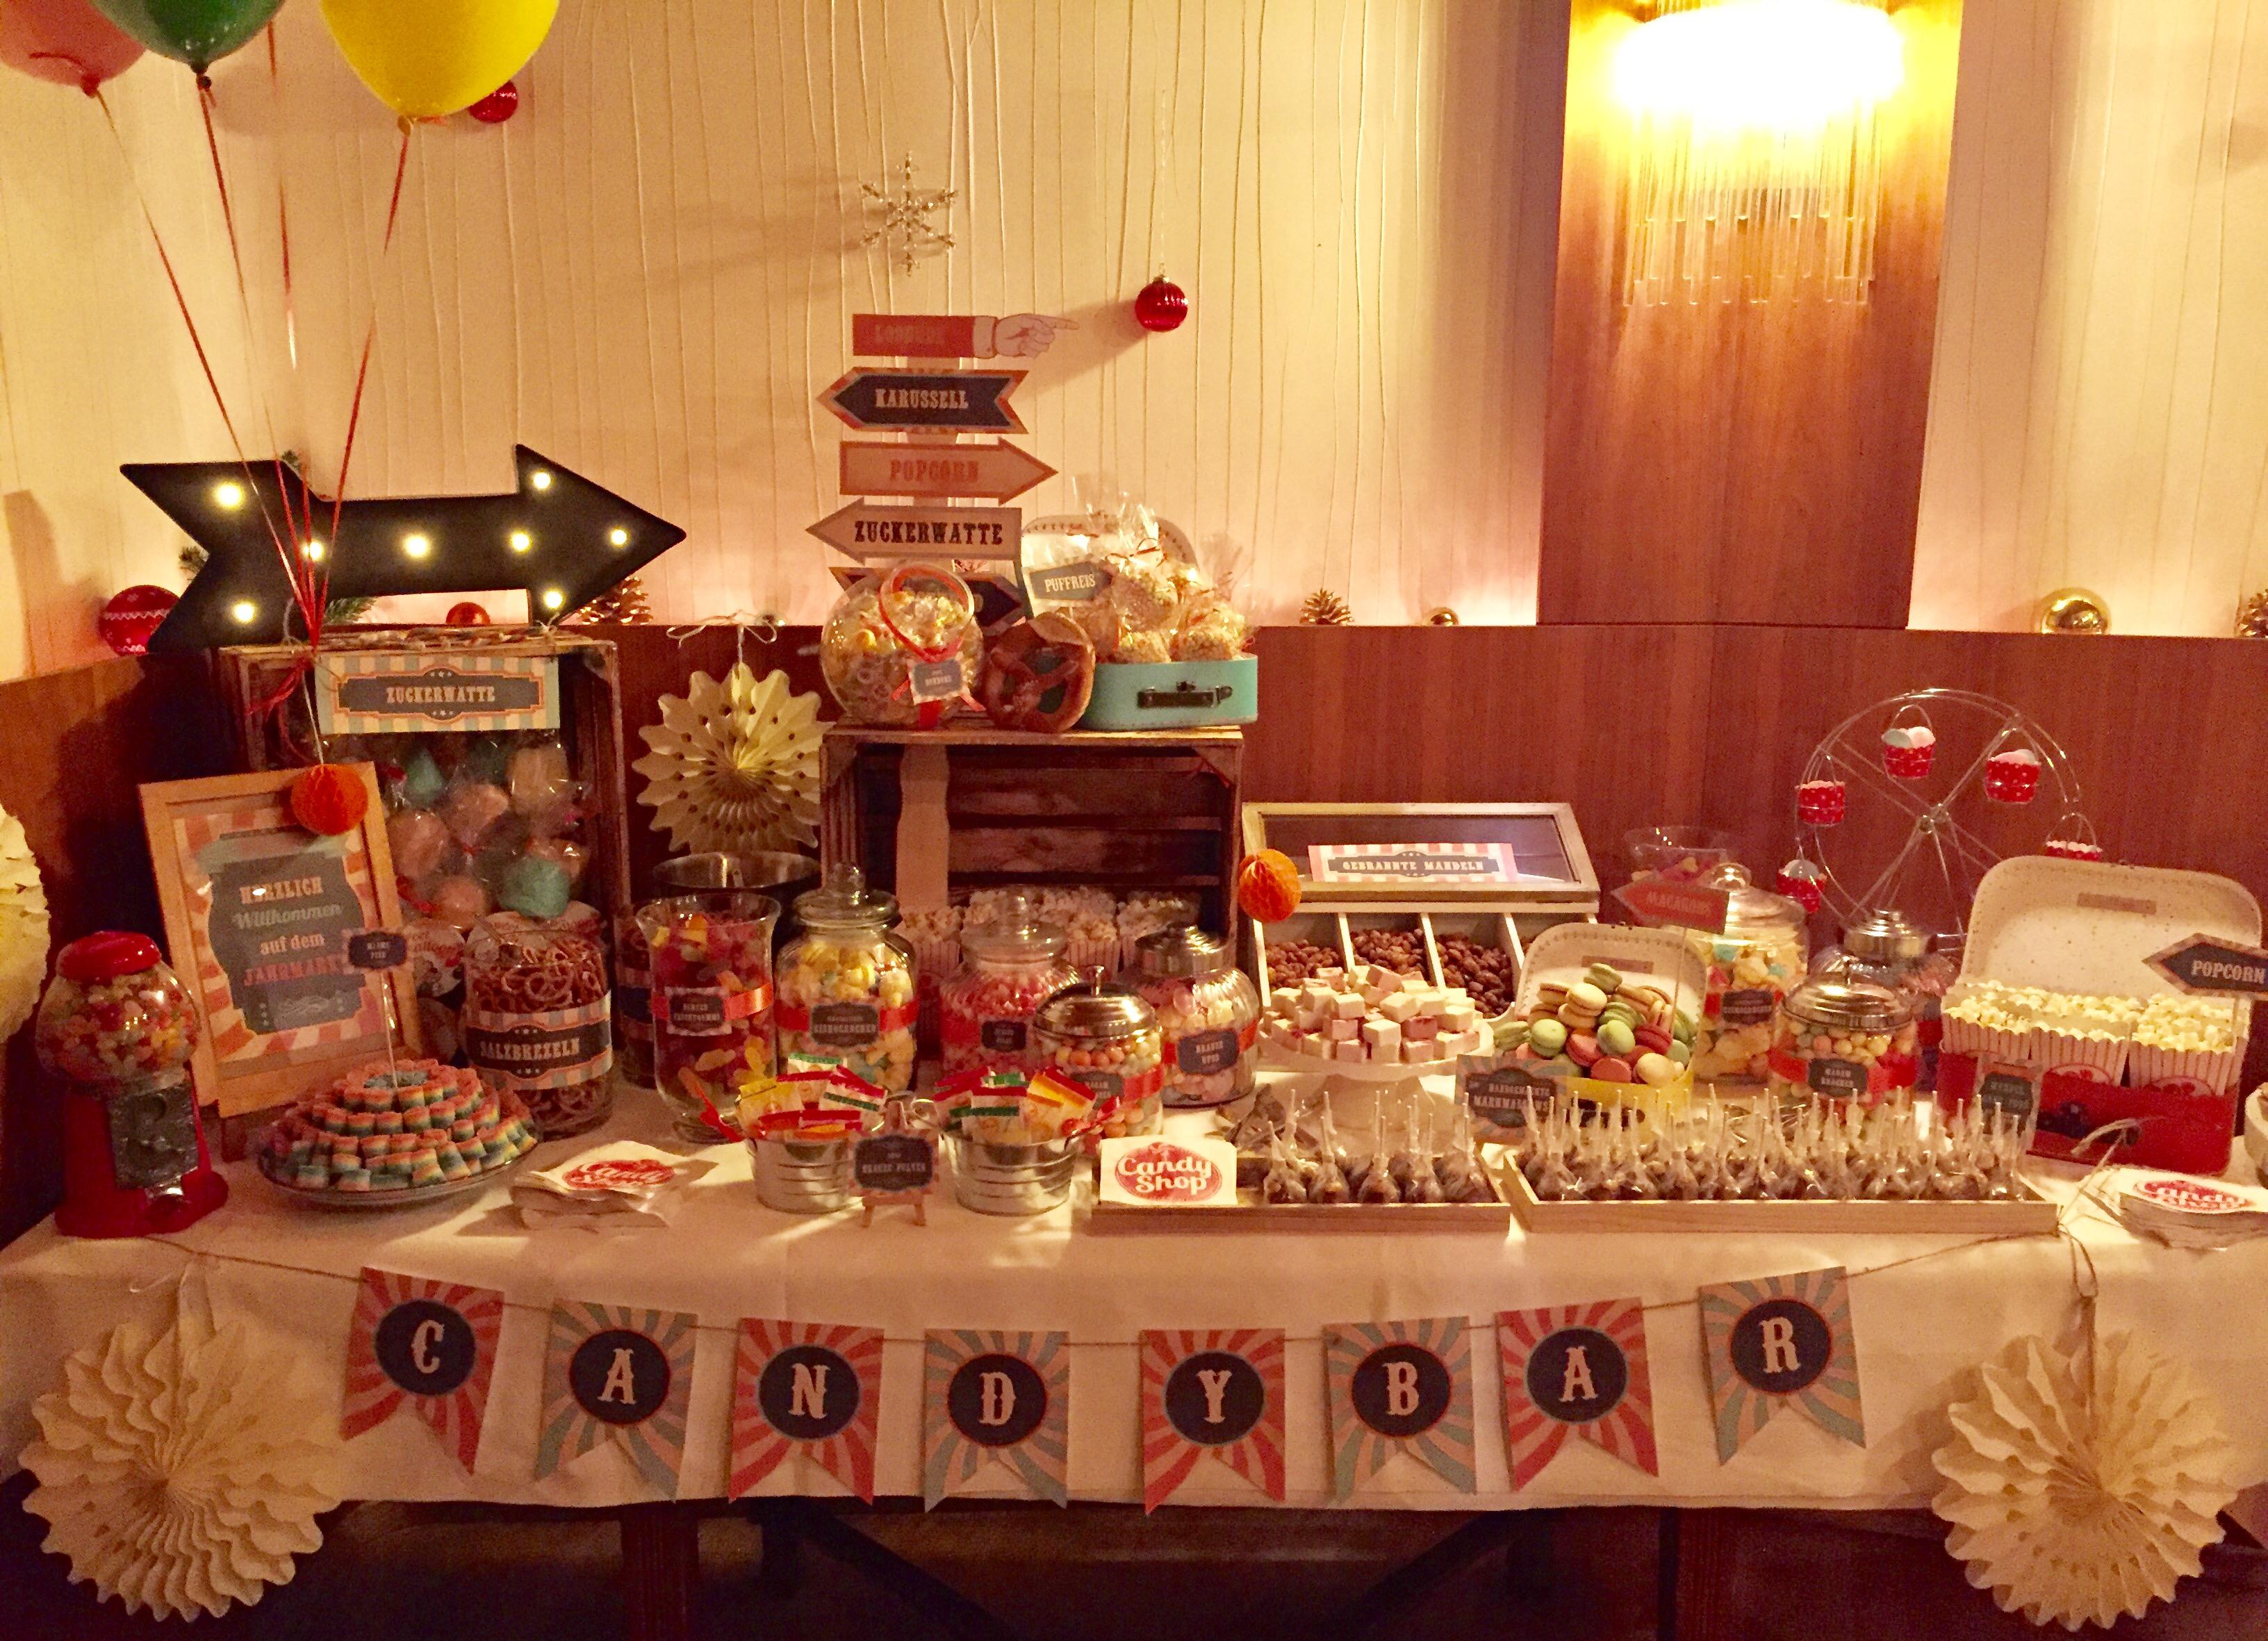 candy-bar-stuttgart-mieten-motto-theme-jahrmarkt-vintage-fun-fair-candy-table